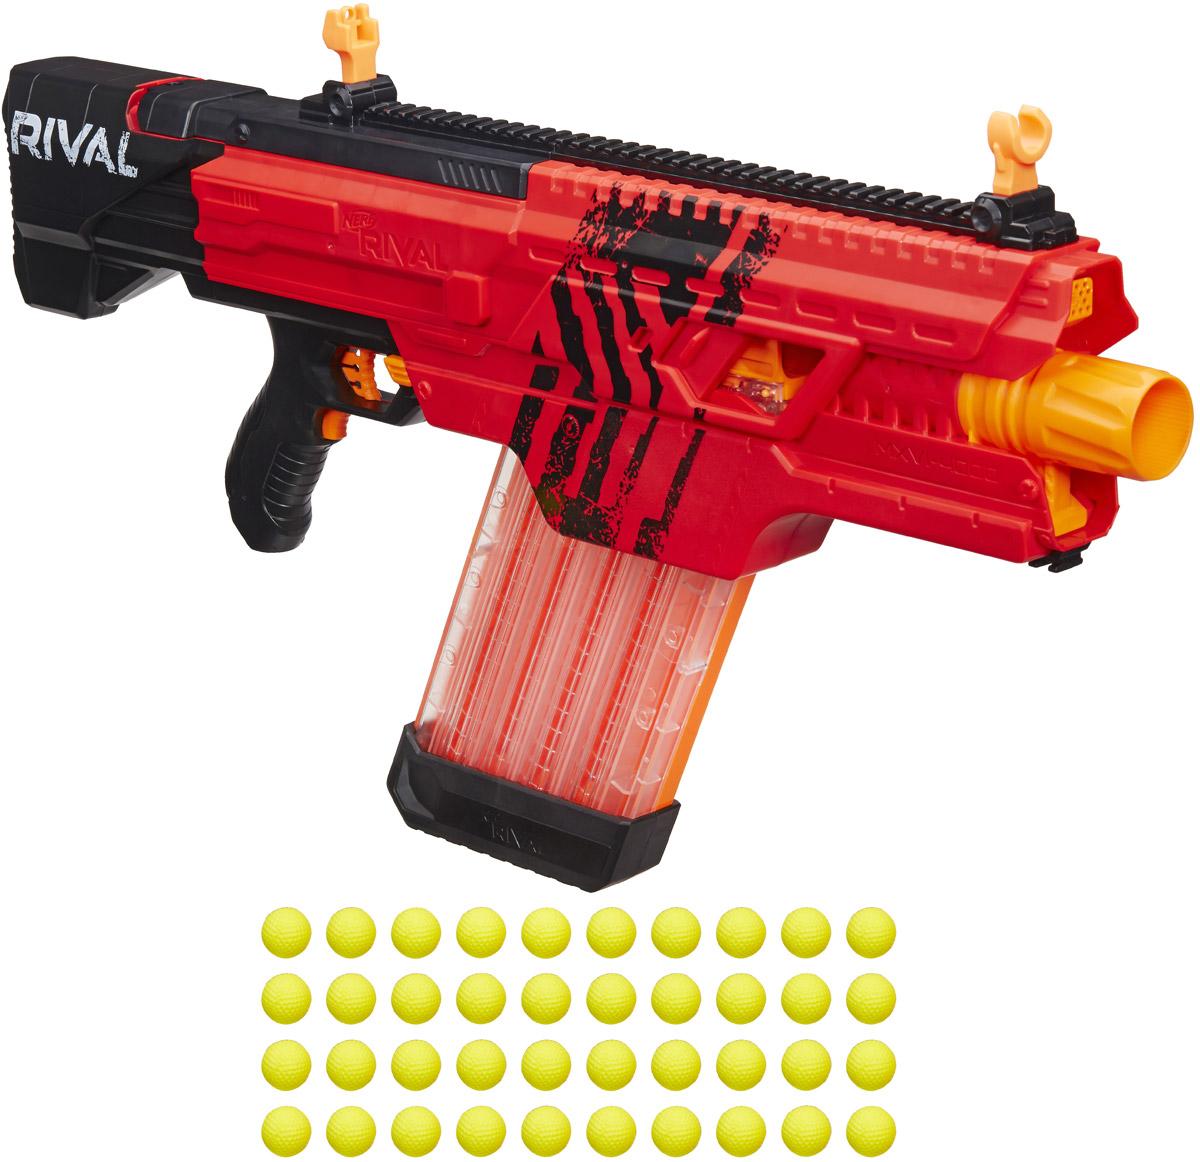 Бластер Nerf Rival Khaos, B3858, красный бластер наша игрушка бластер цвет в ассортименте 20112011